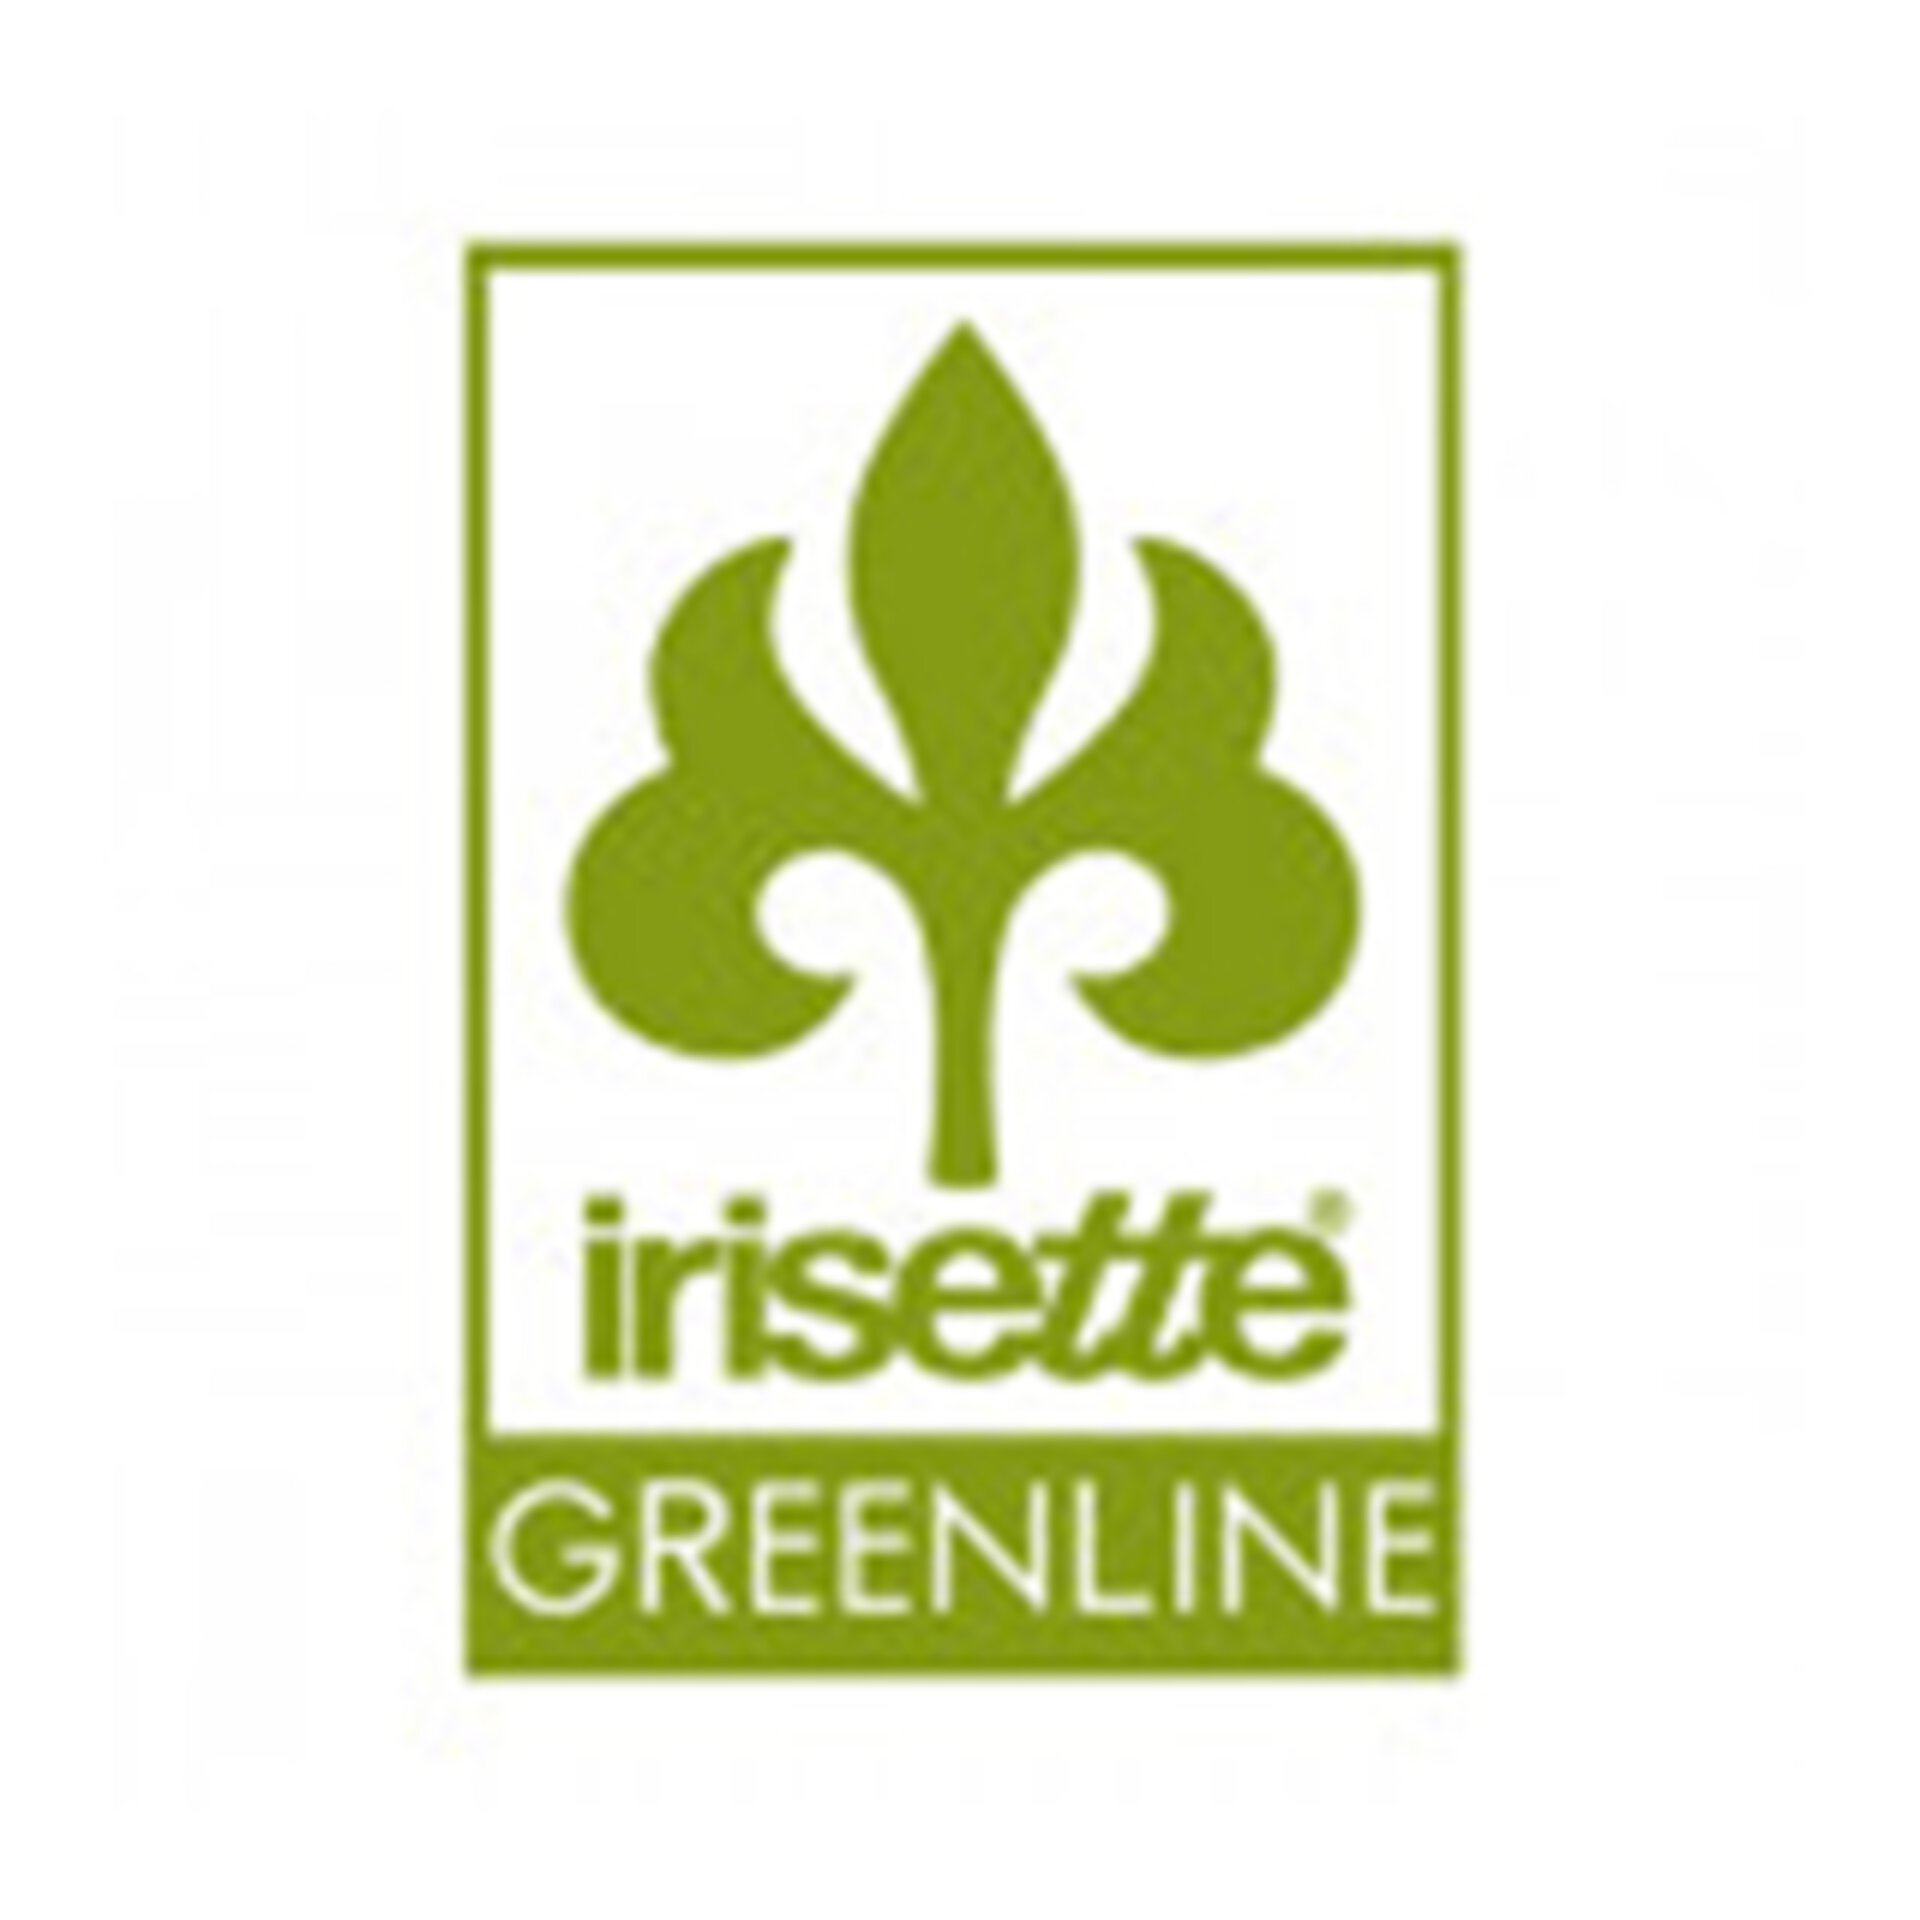 Badenia Irisette Greenline